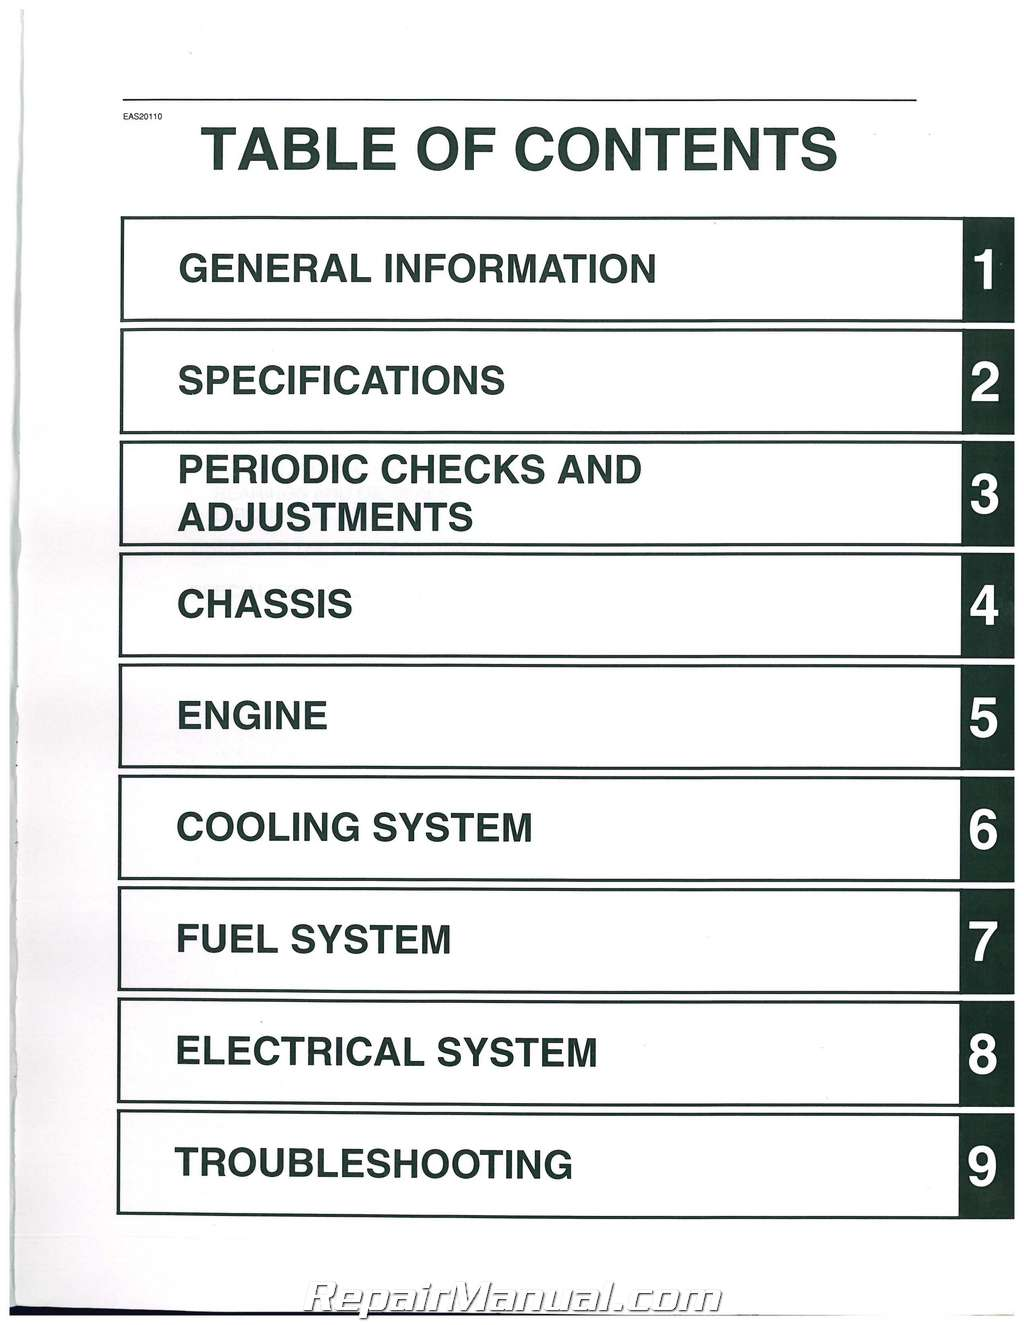 Dunham bush chillers service manual